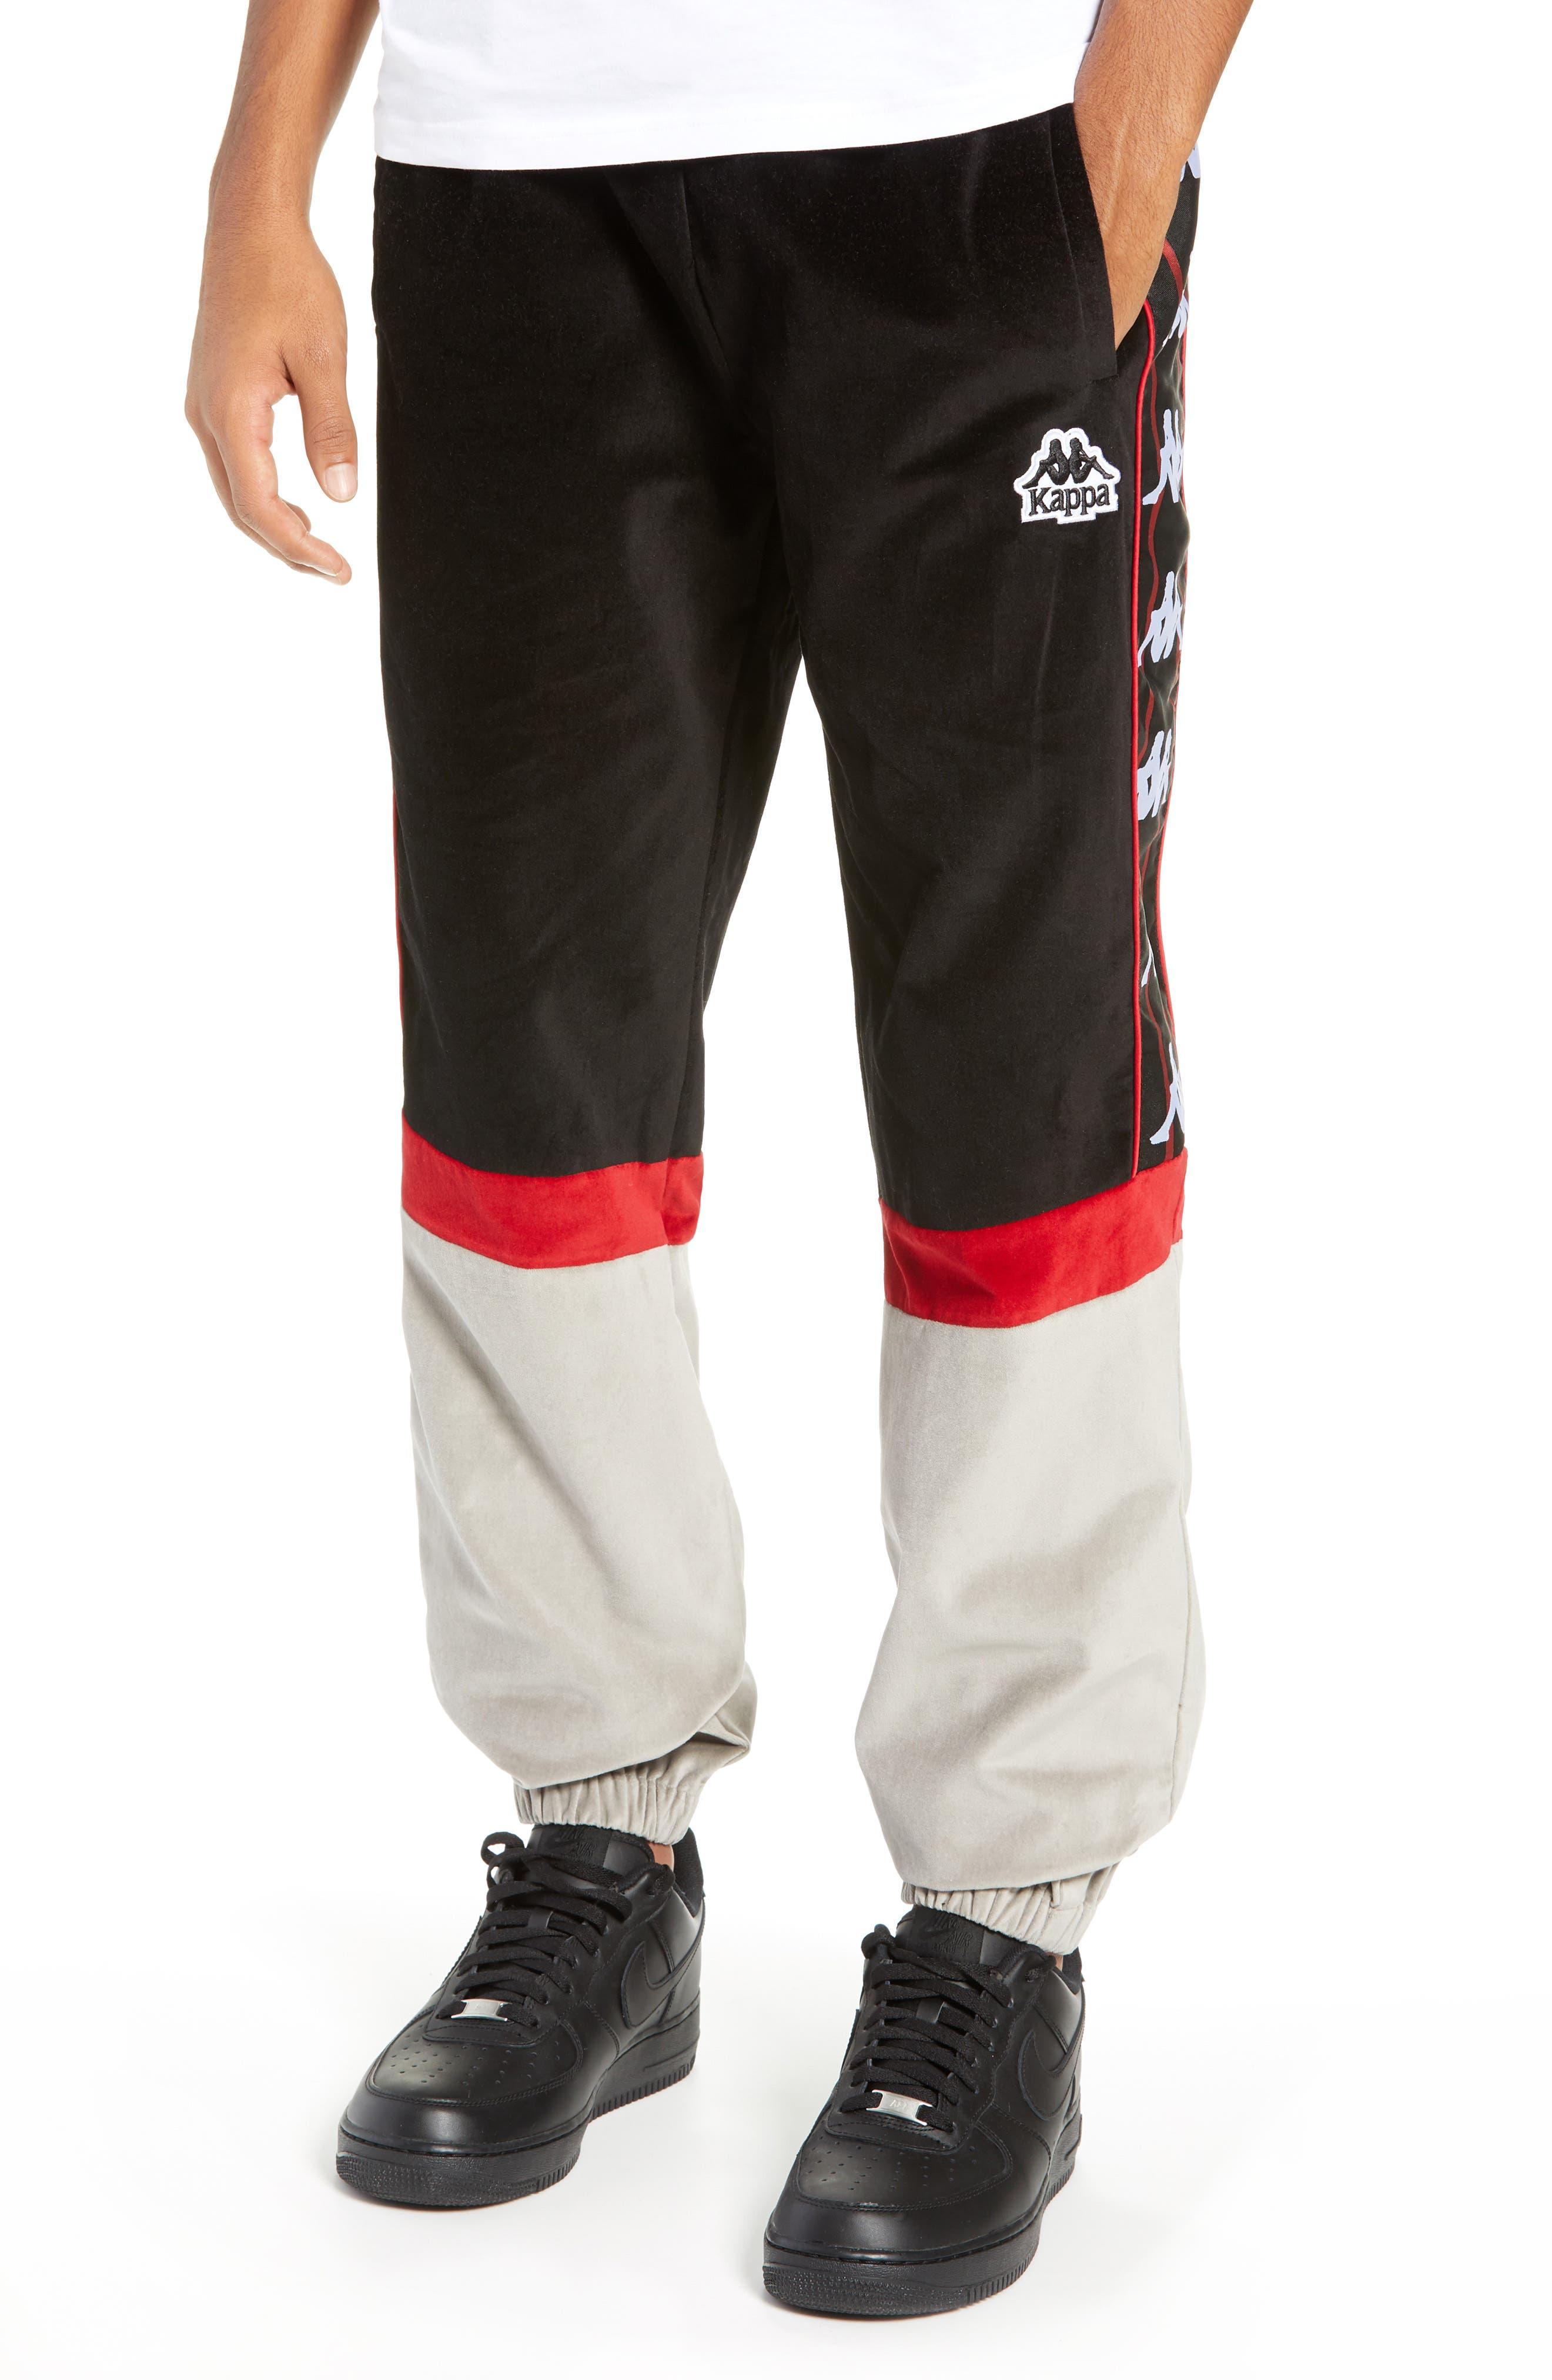 Authentic Serena Cotton Velour Track Pants,                             Main thumbnail 1, color,                             BLACK/ RED/ GREY